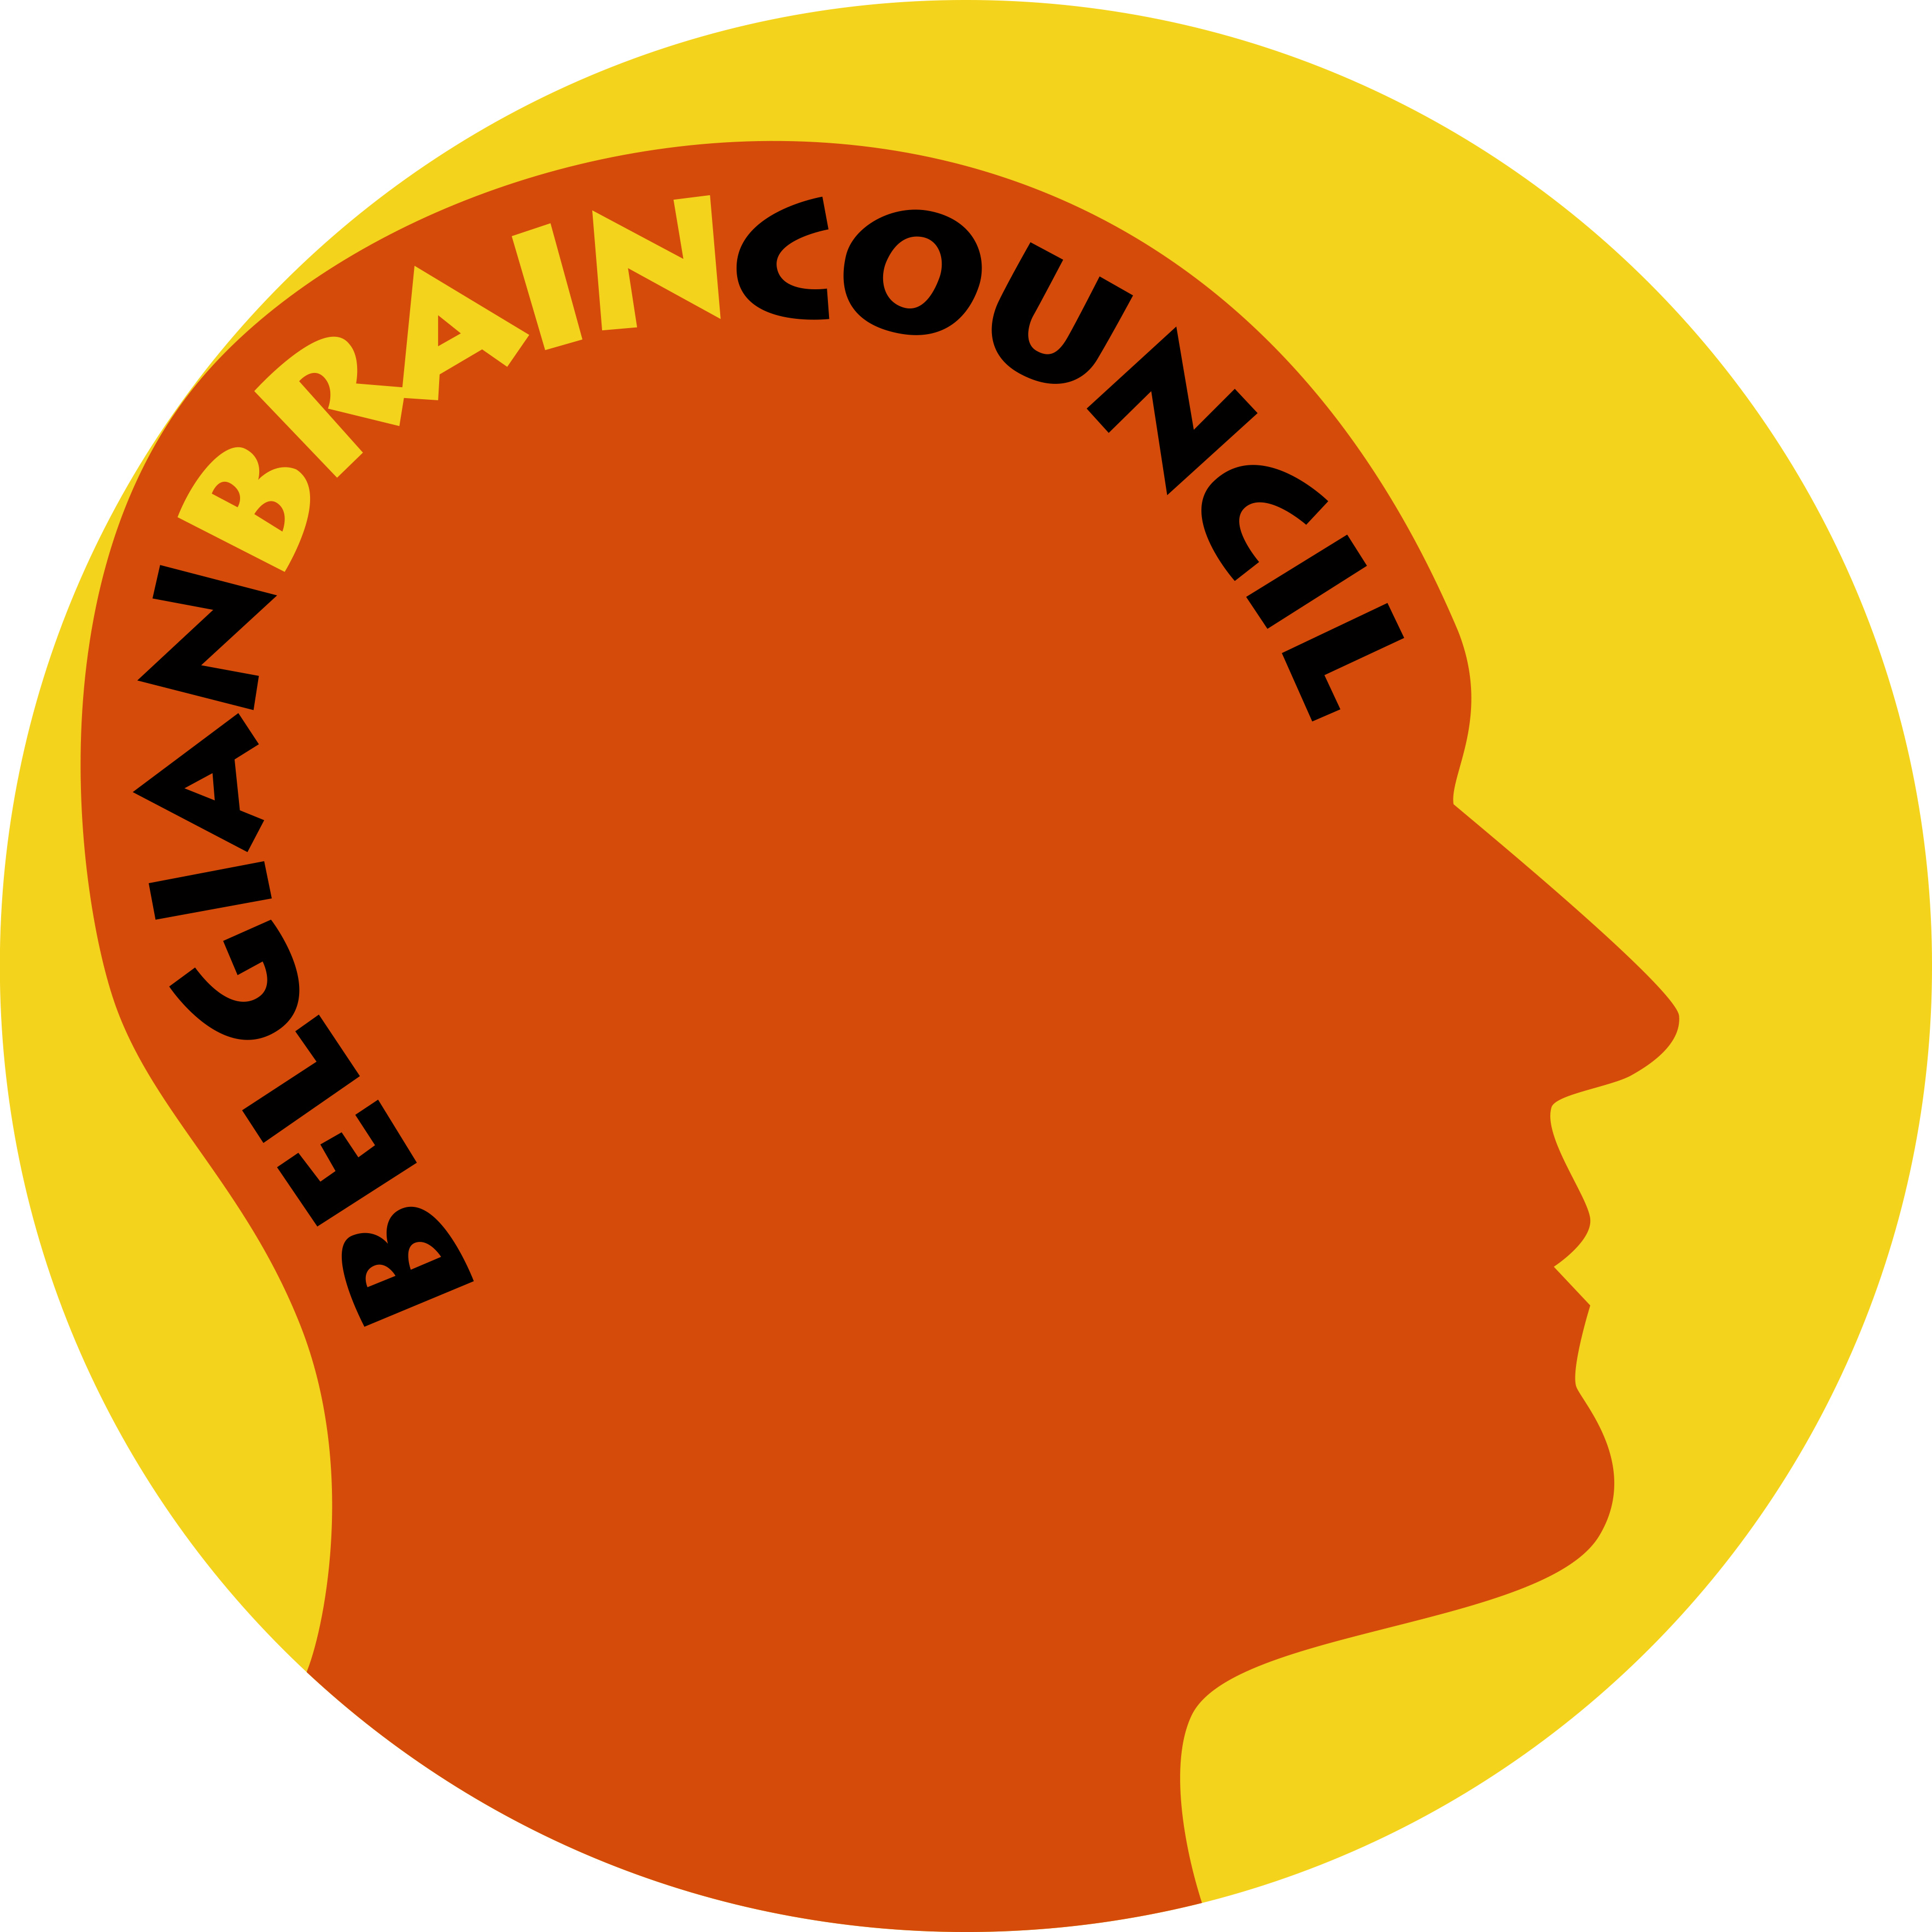 Belgian Brain Council